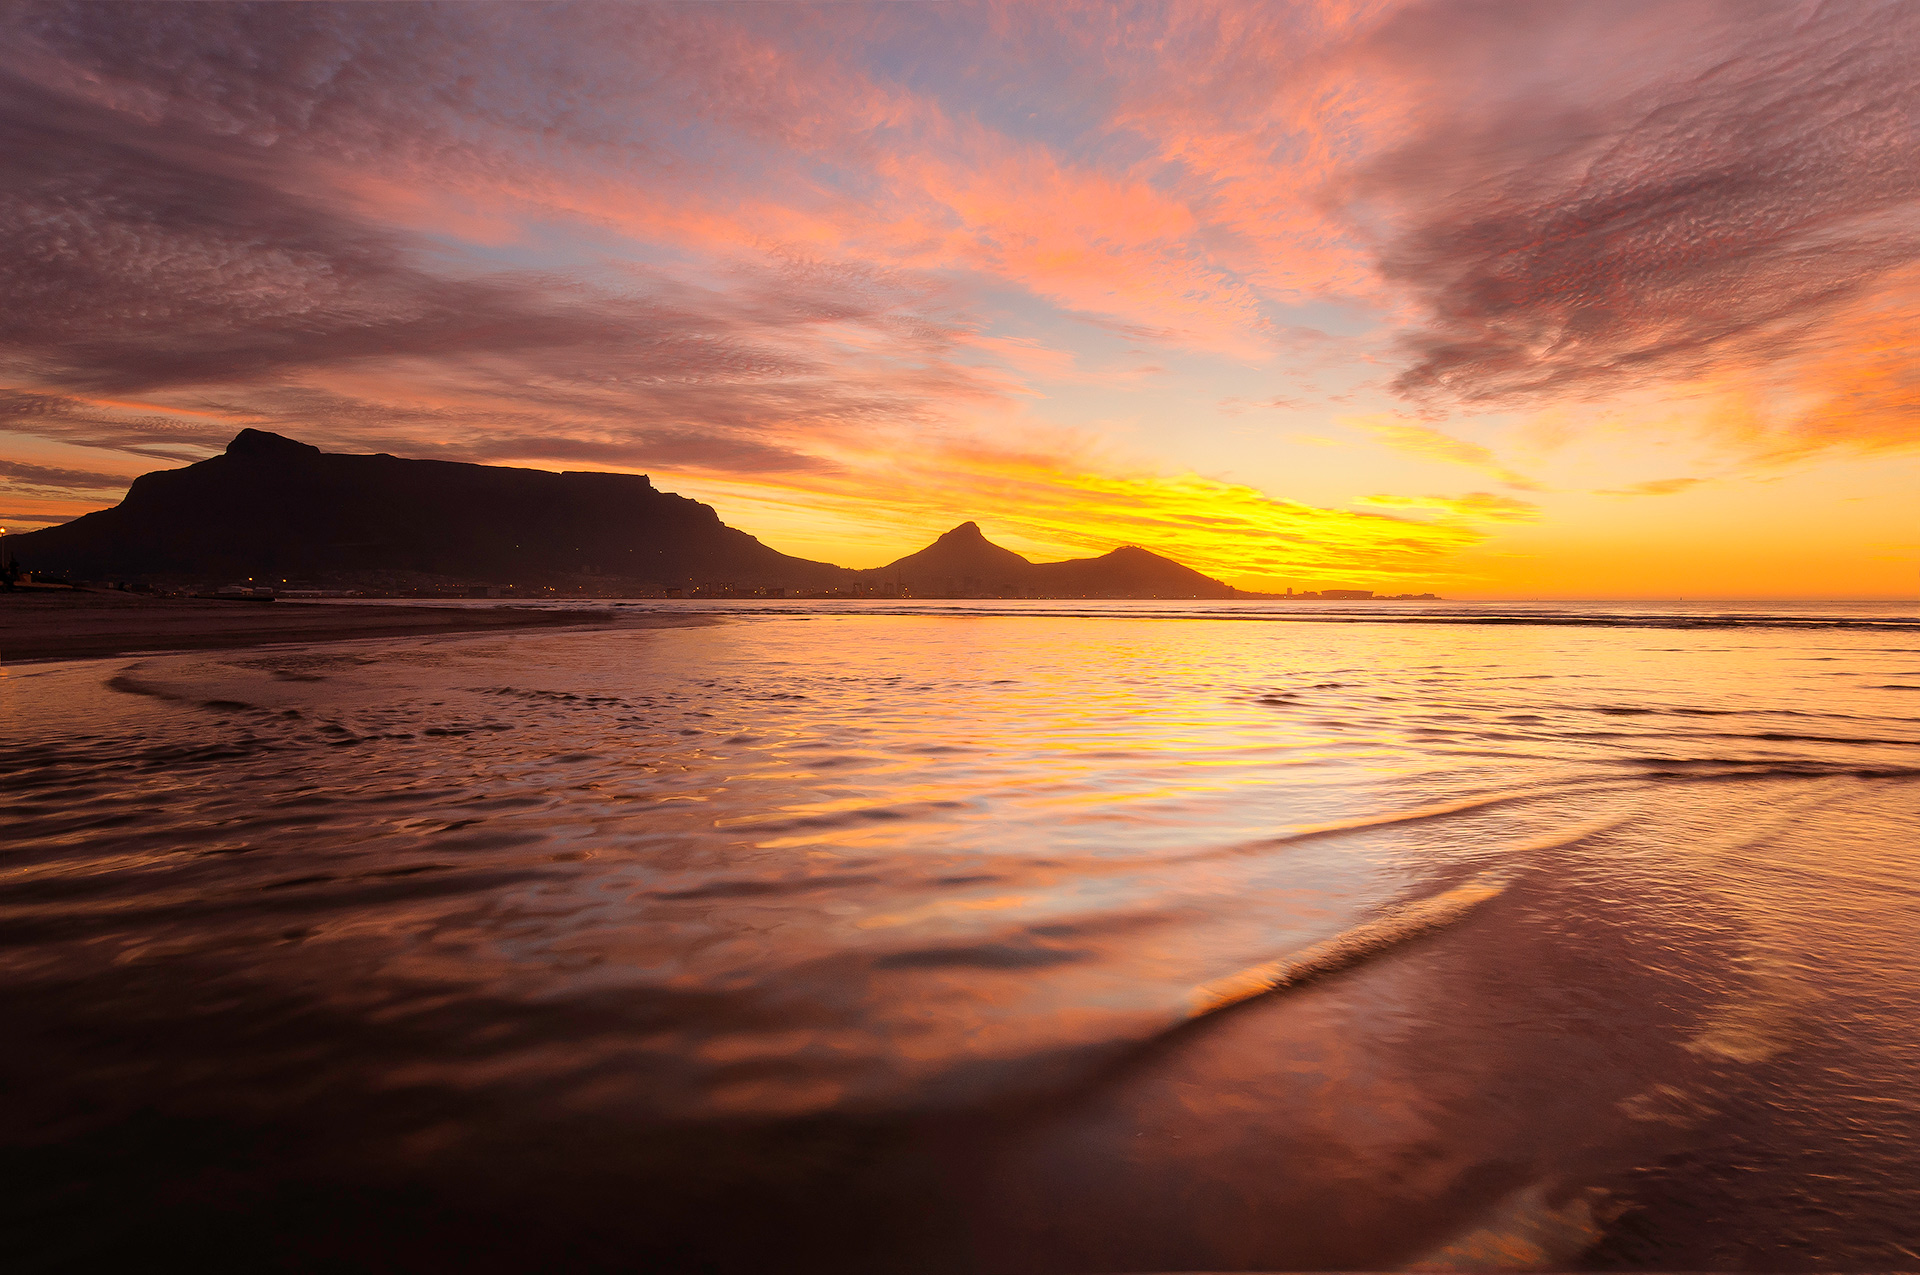 photo tour sunset - private tour Cape Town – photo tours